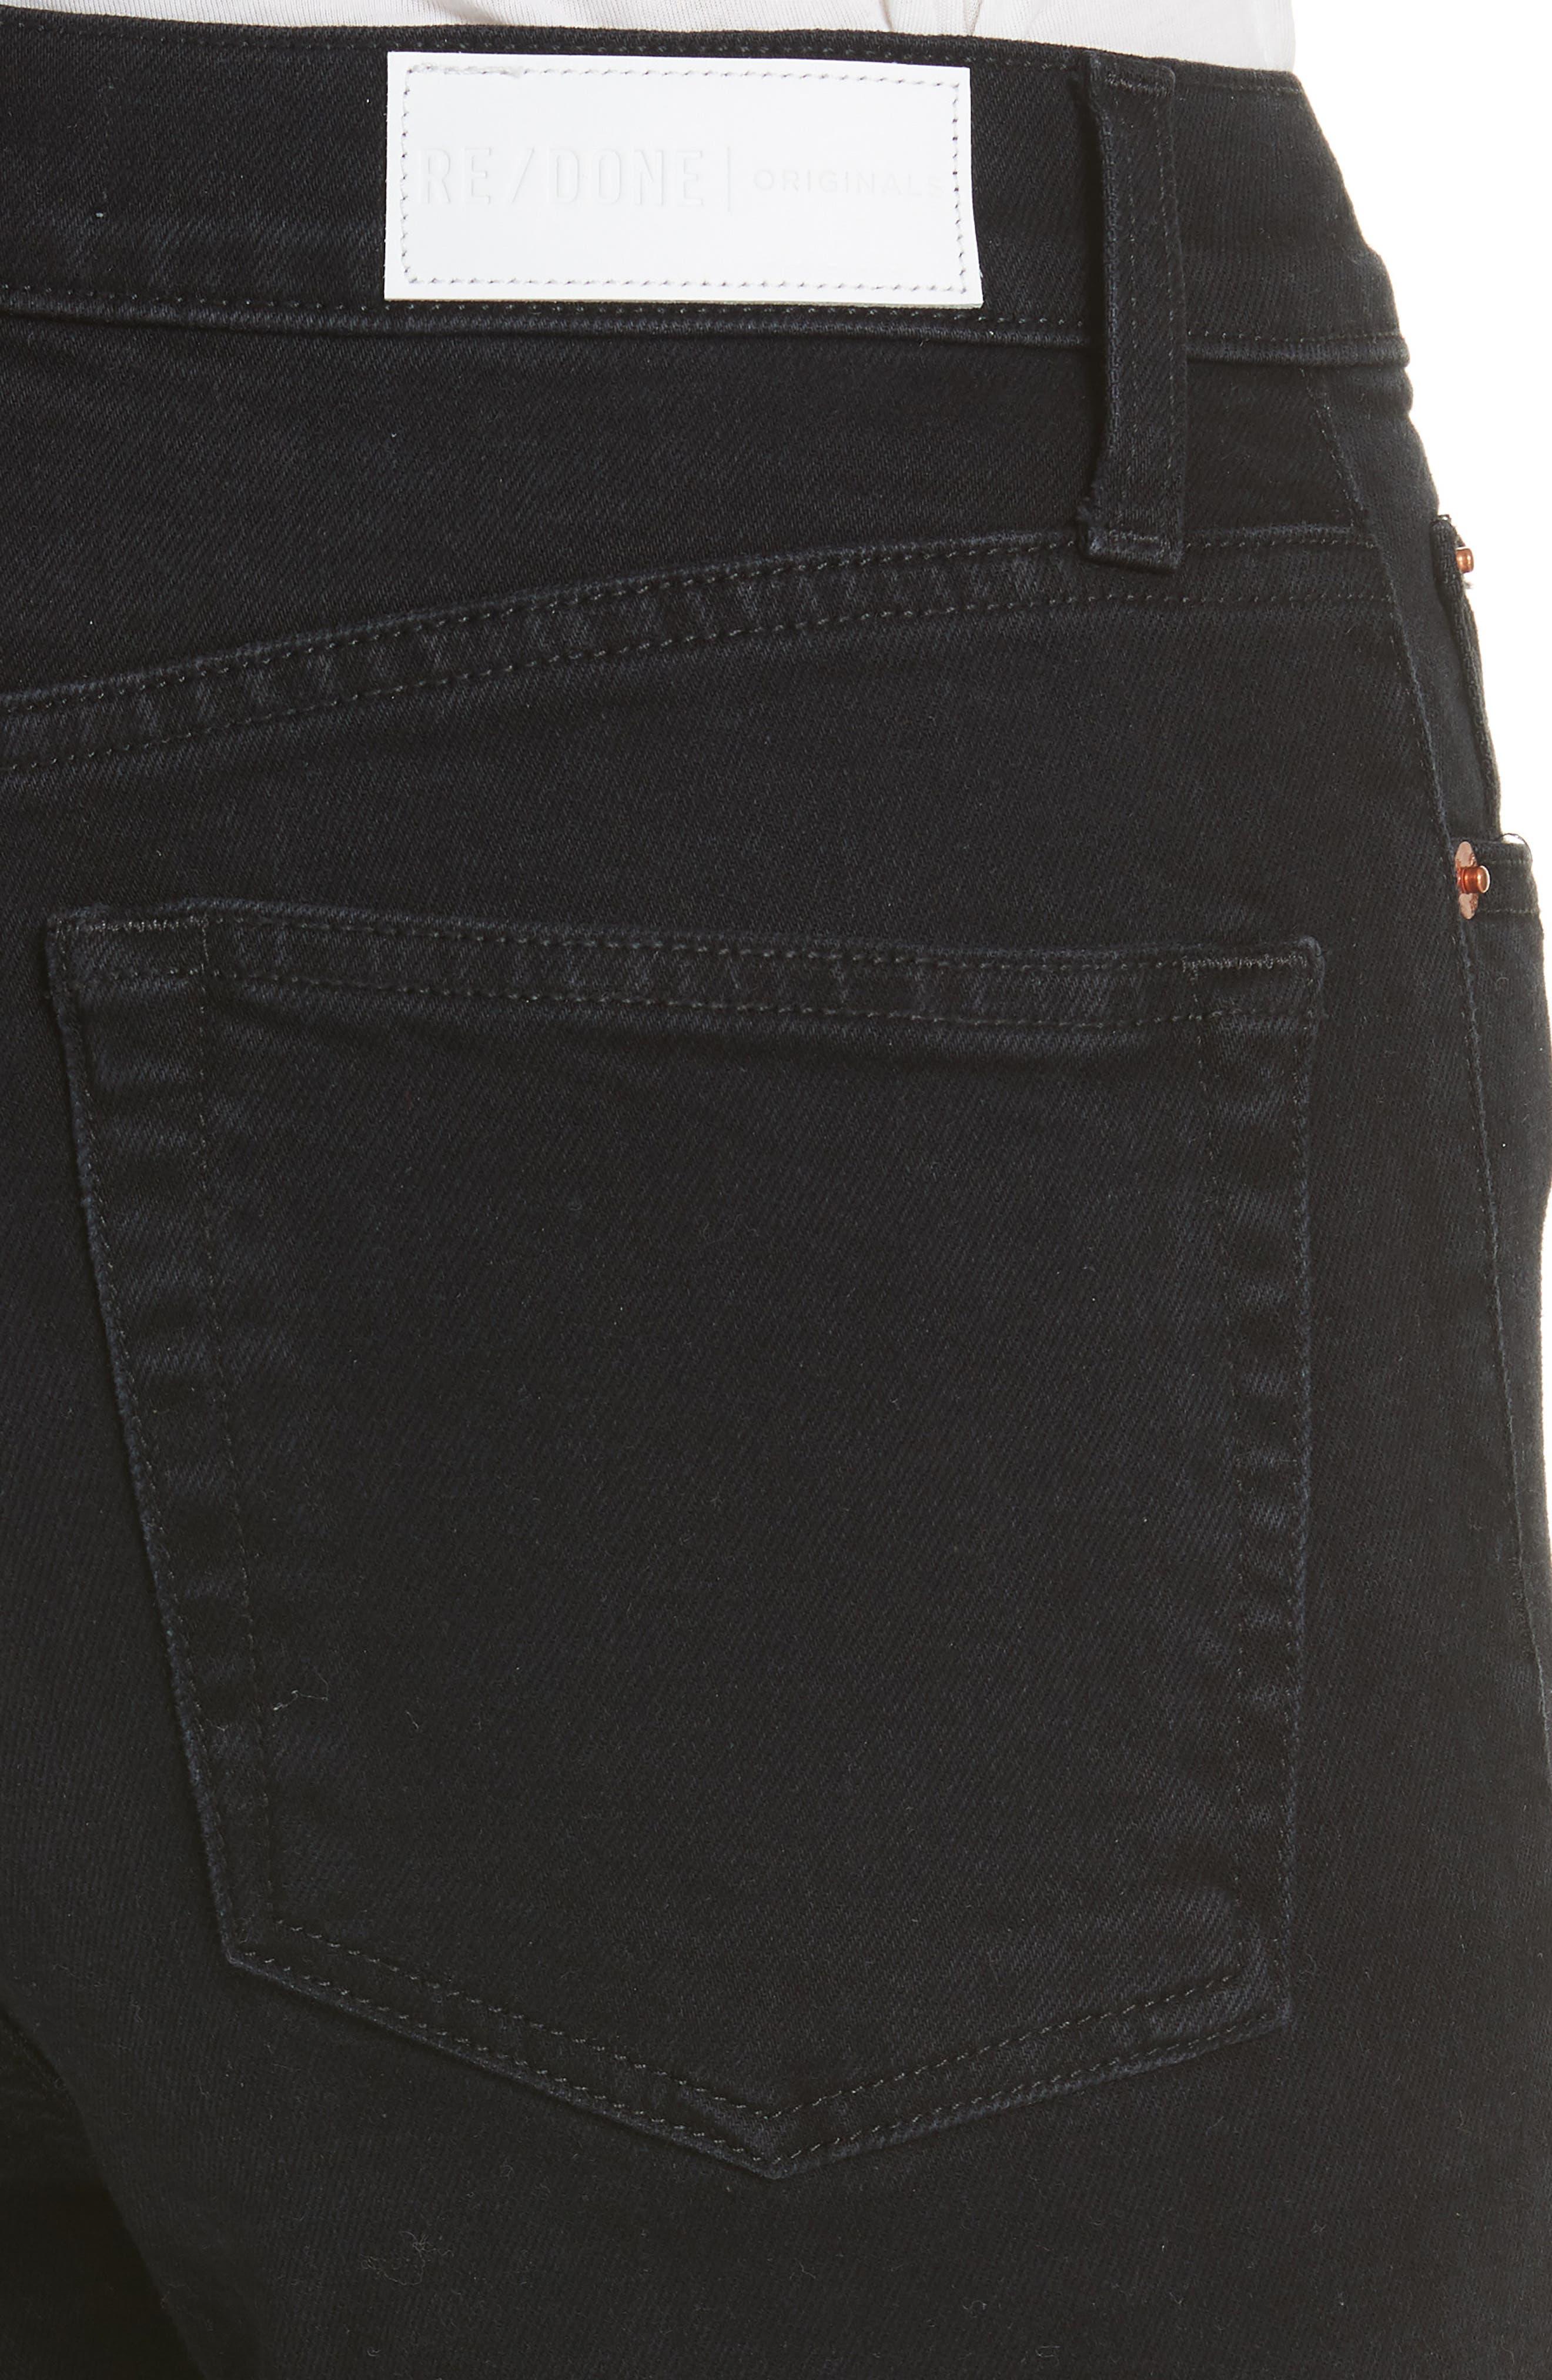 High Waist Ankle Jeans,                             Alternate thumbnail 4, color,                             Black Destroy